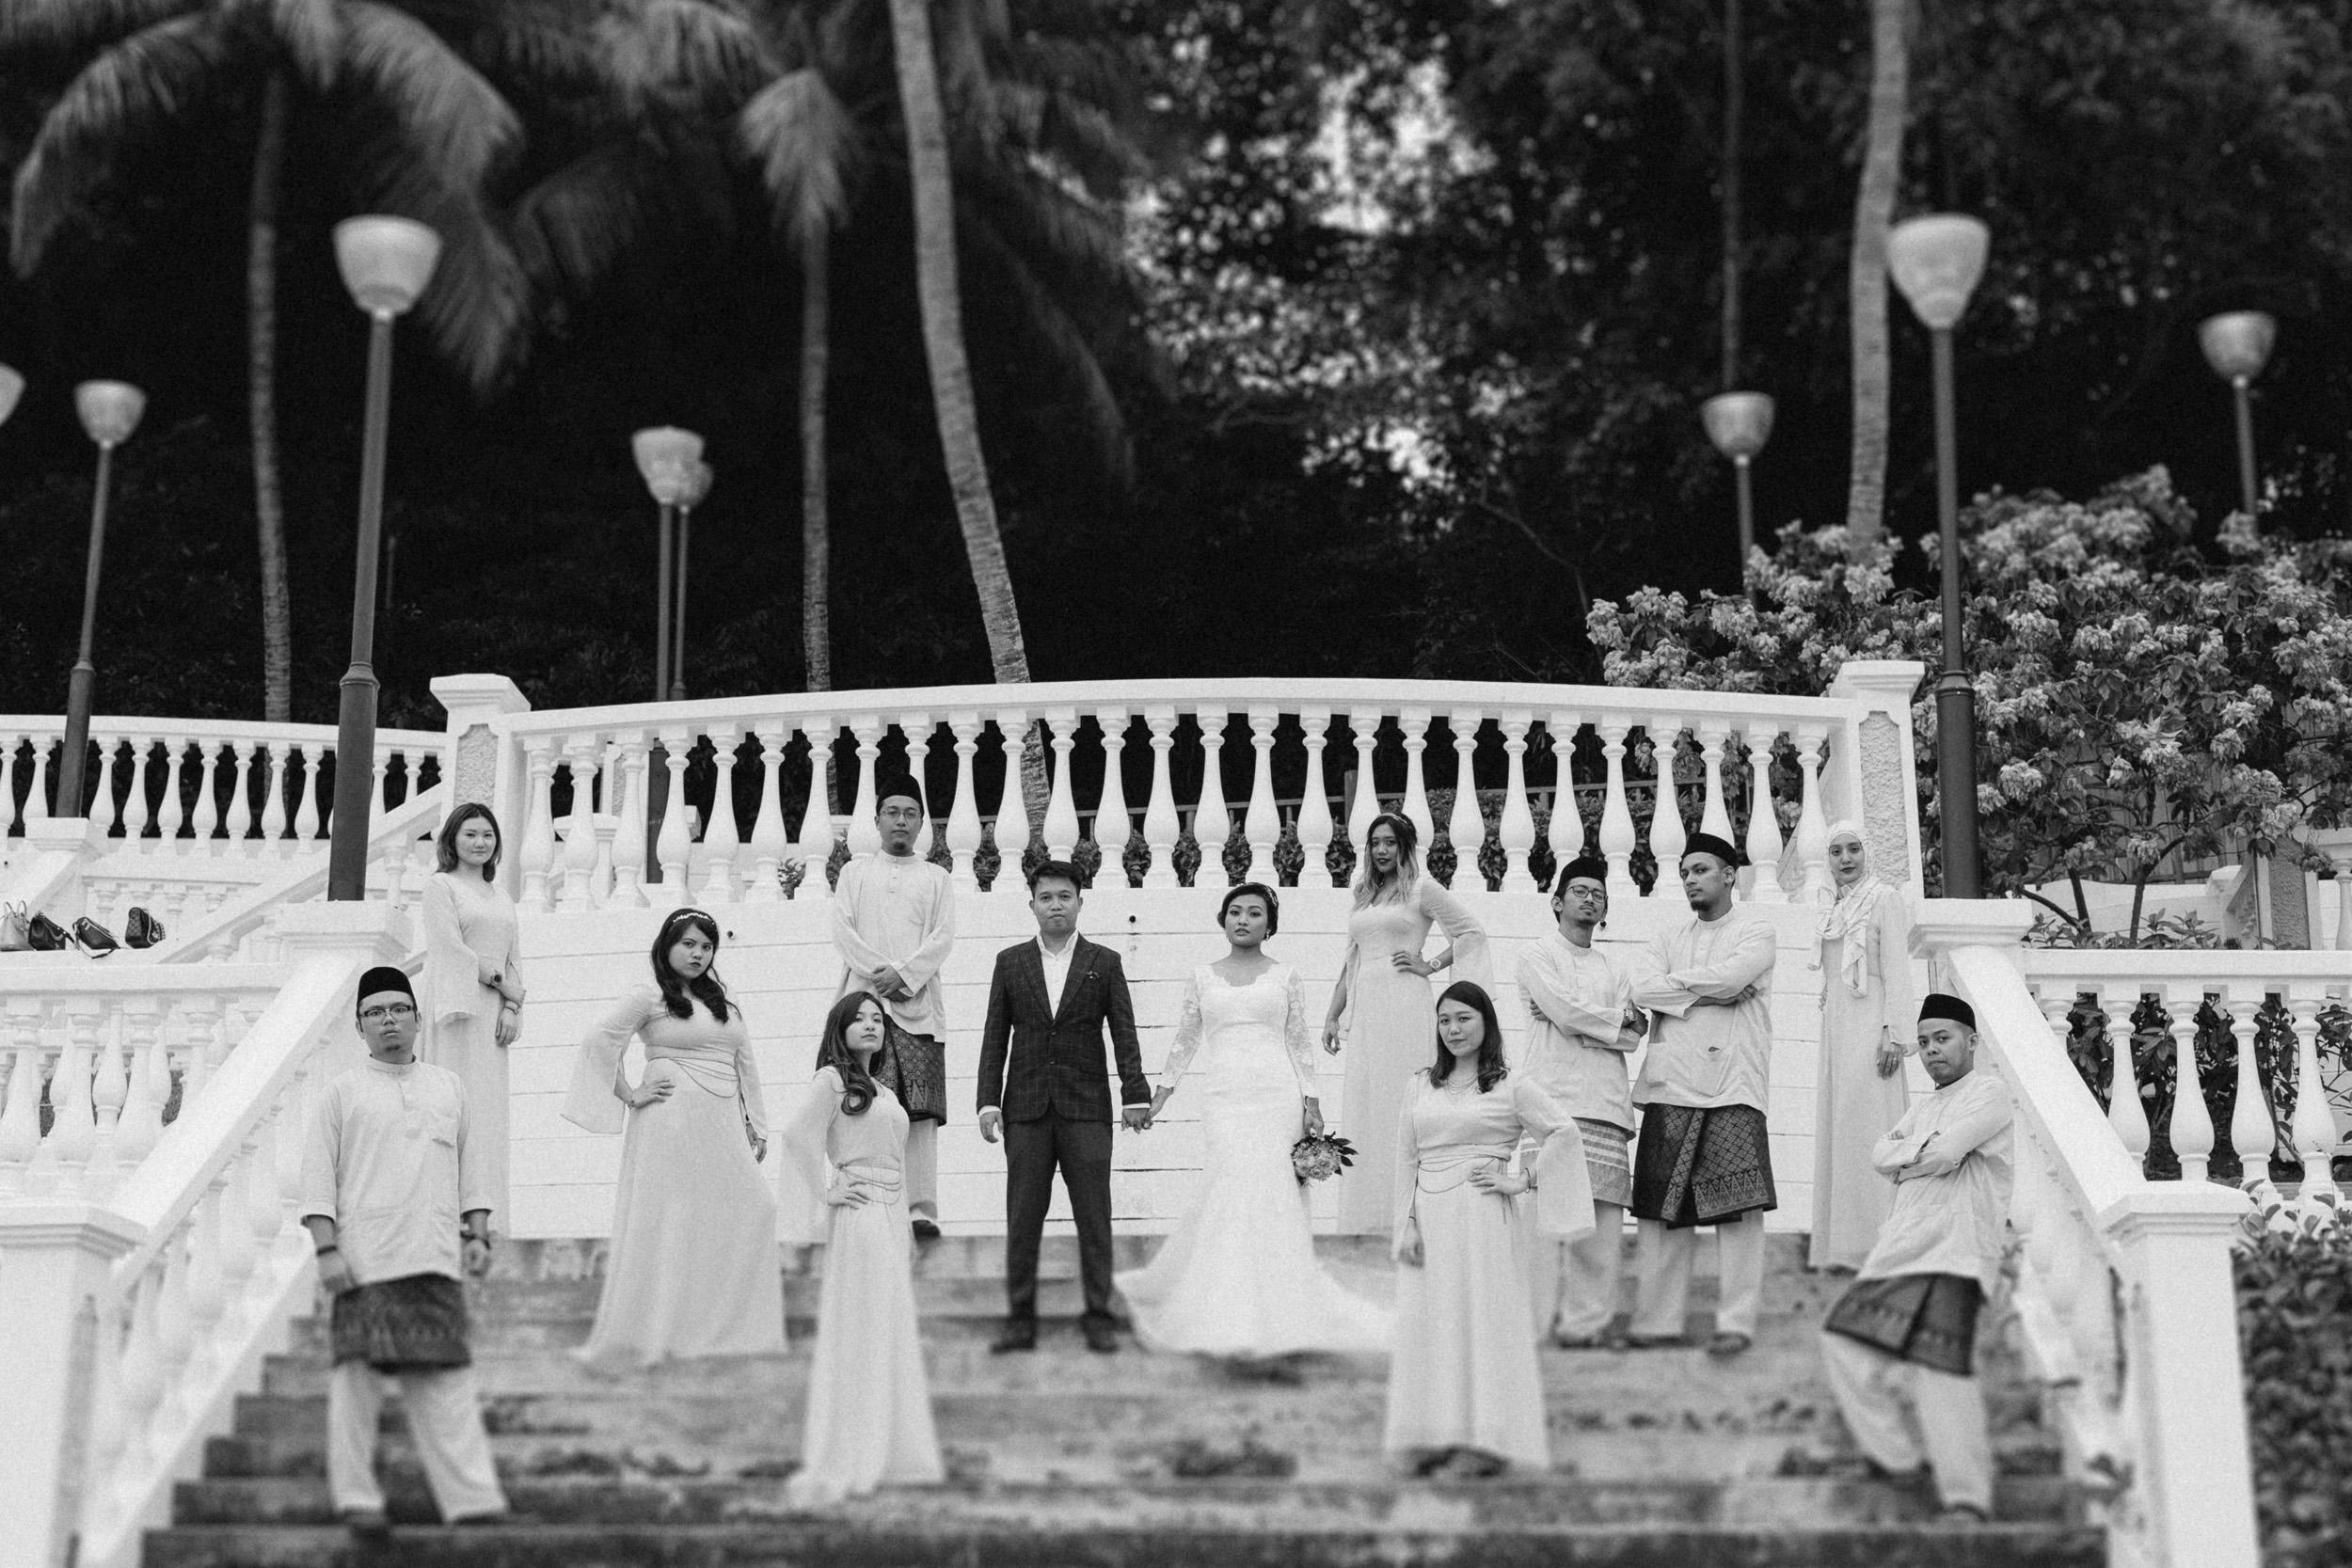 singapore-wedding-photographer-photography-wmt2017-078.jpg